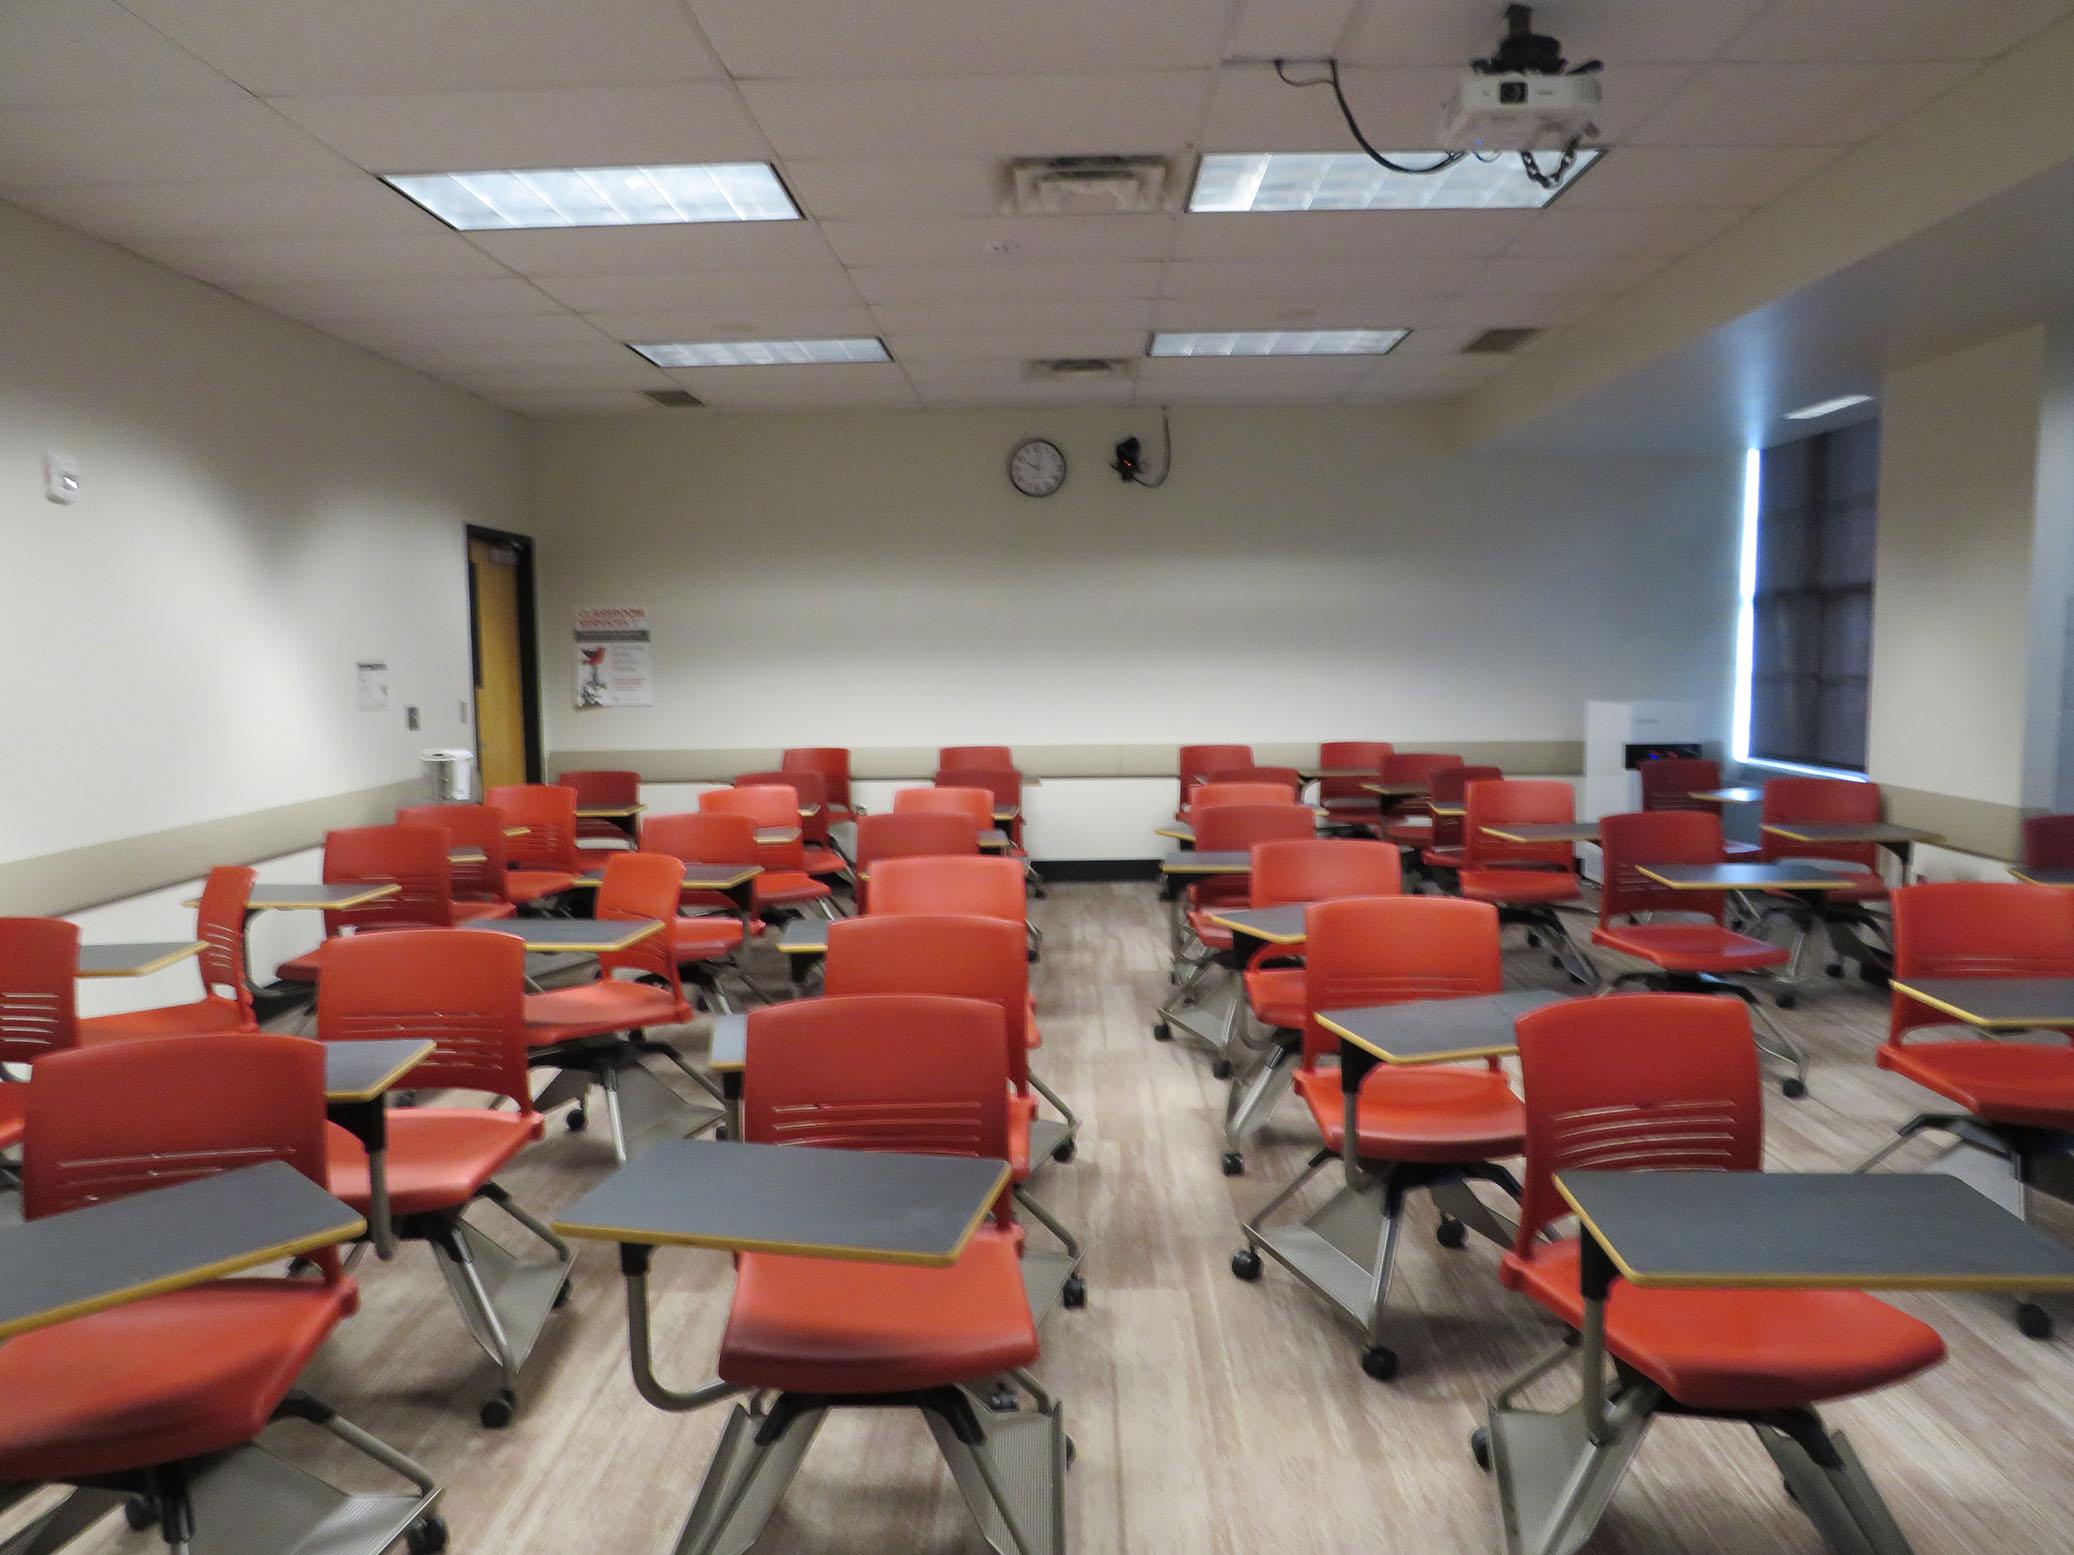 Denney Hall Room 206